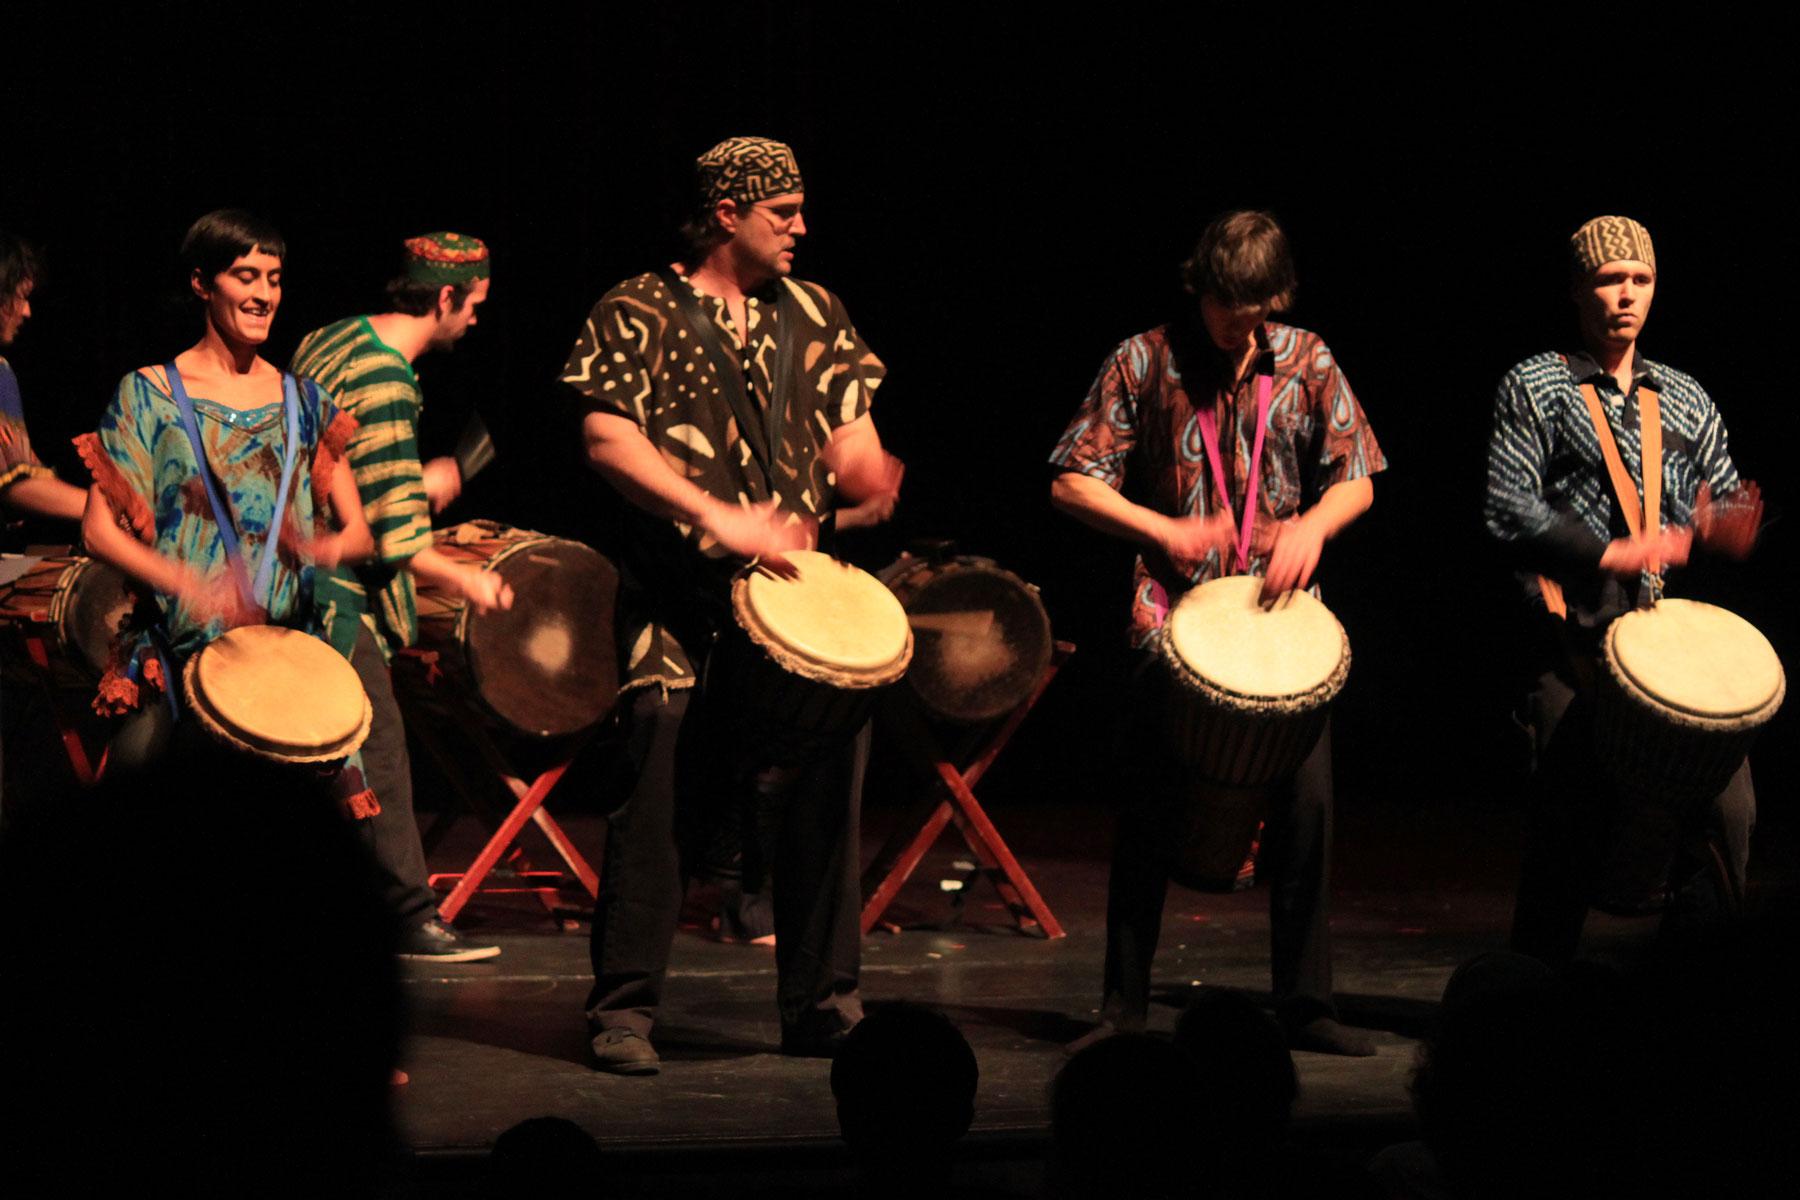 percussiongruppe